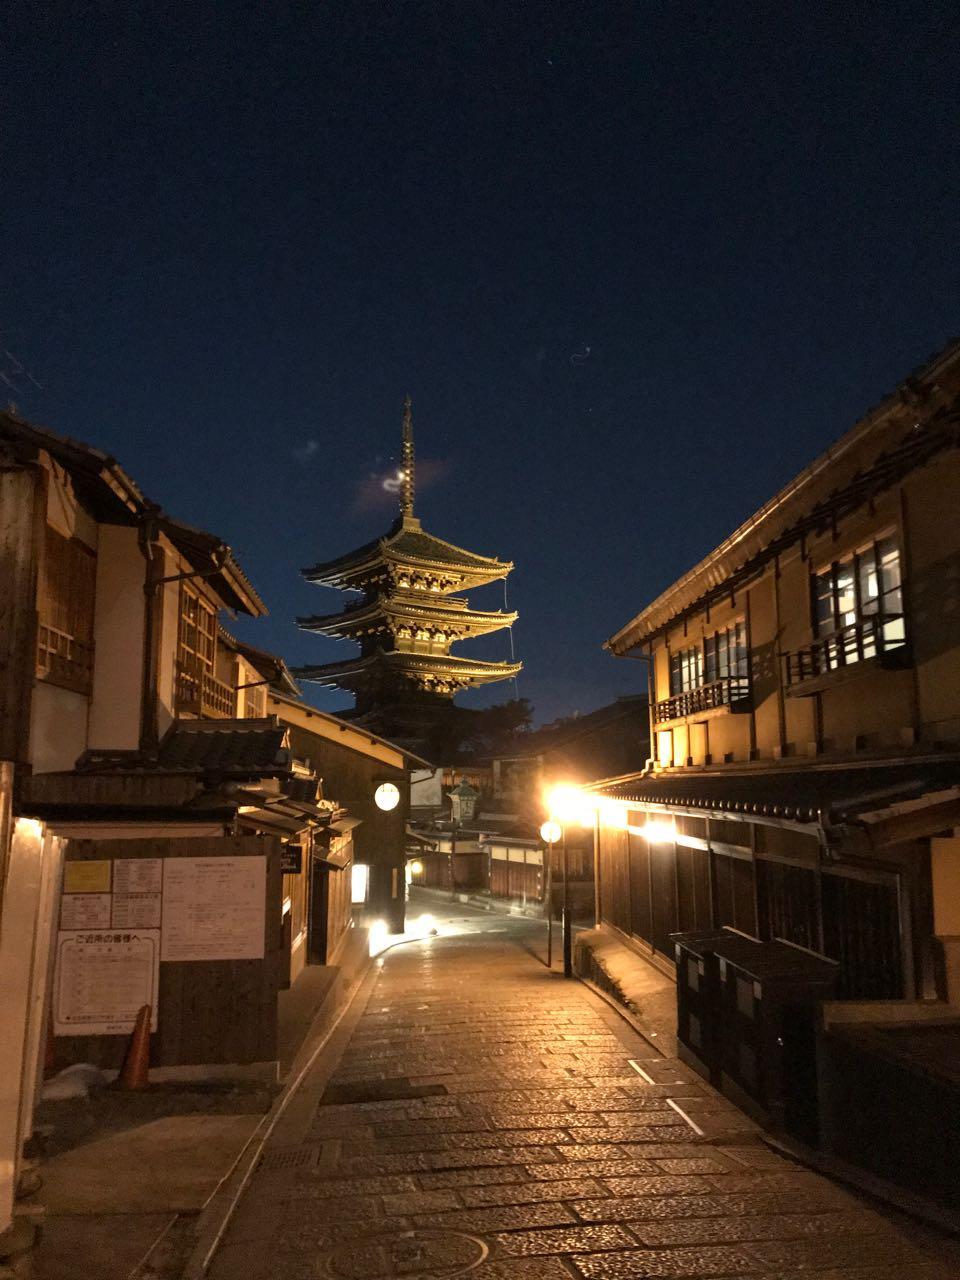 pagoda at night.jpg